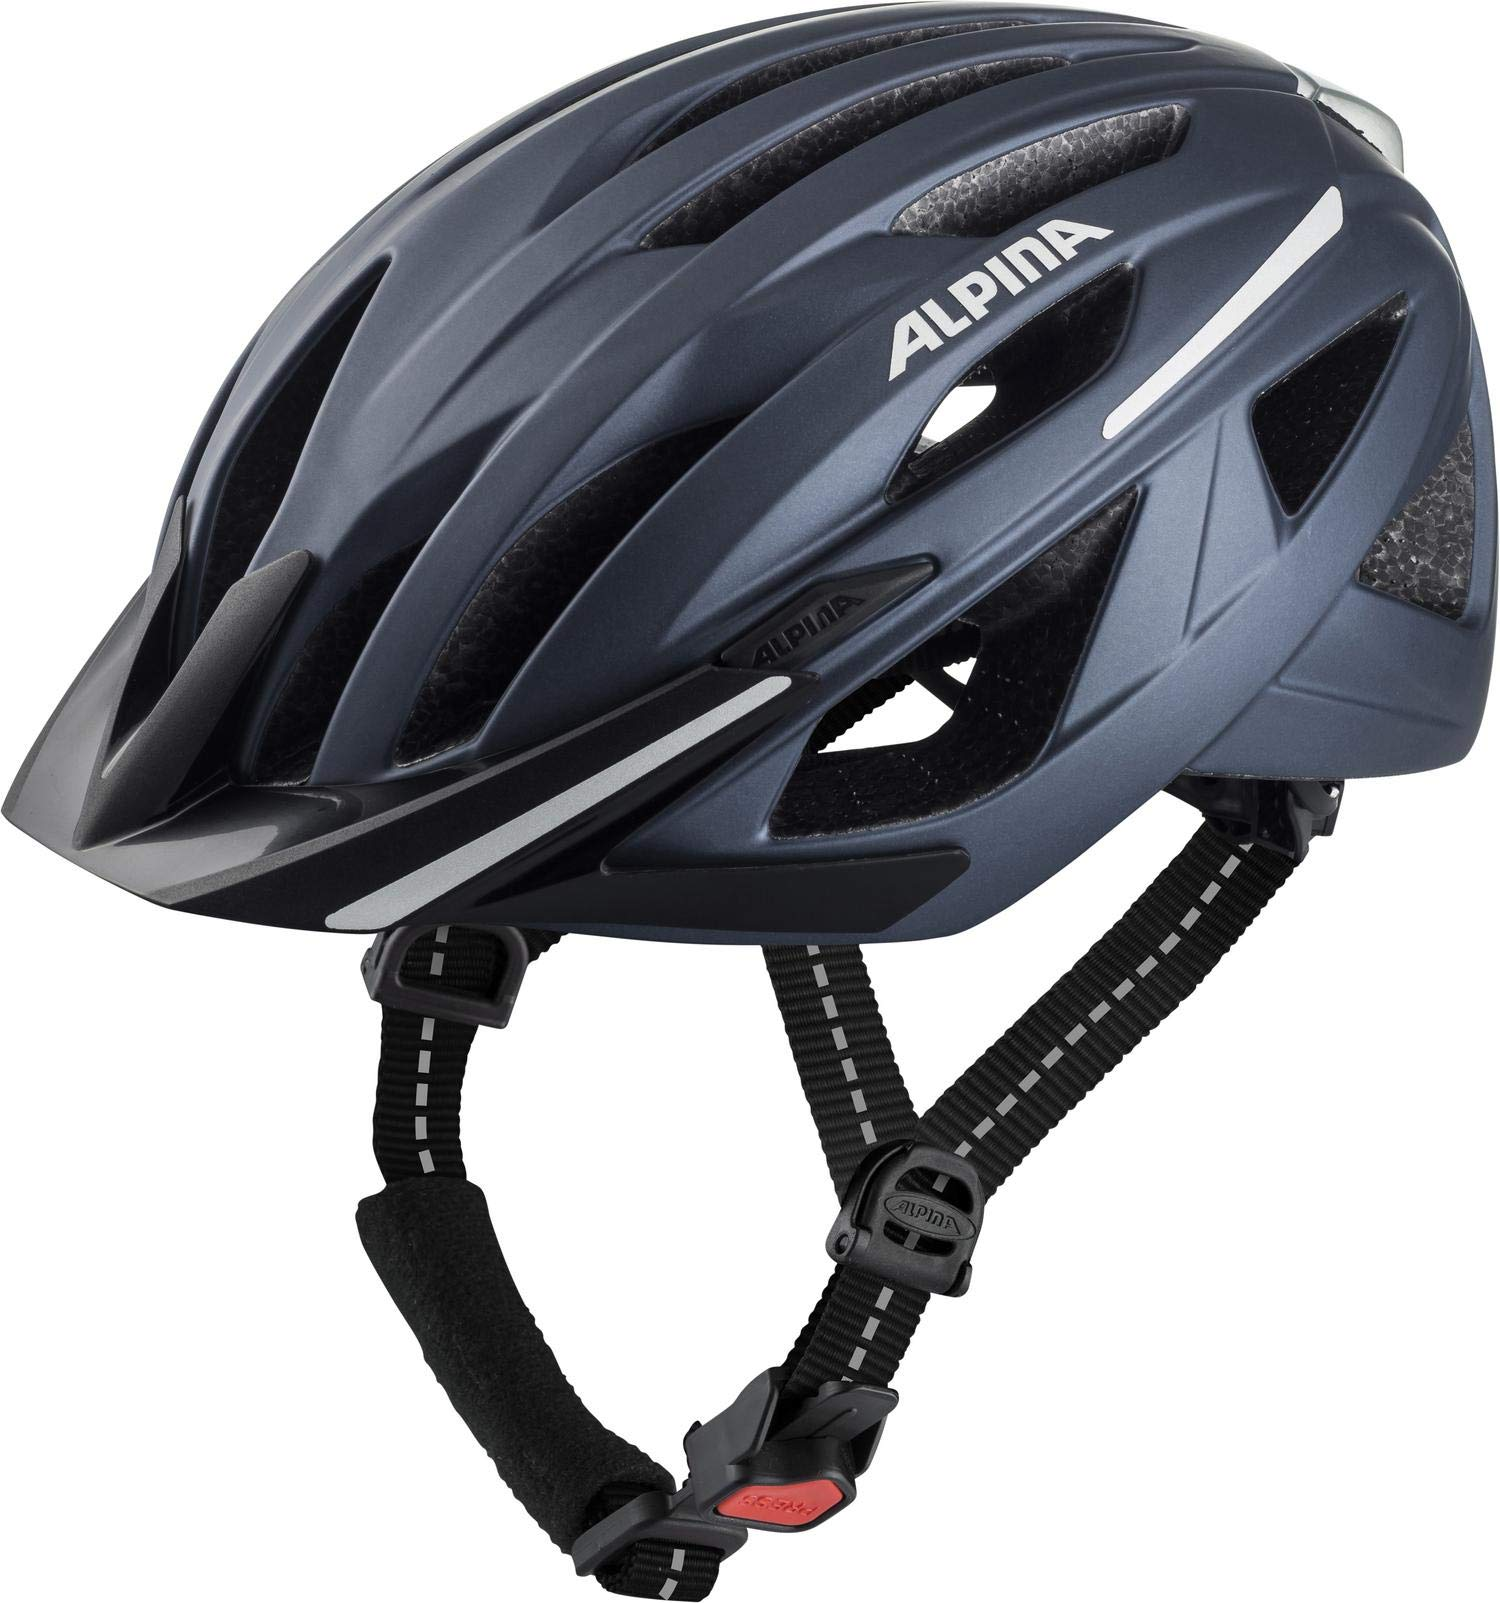 ALPINA Unisex - Erwachsene, HAGA Fahrradhelm, indigo matt, 51-56 cm